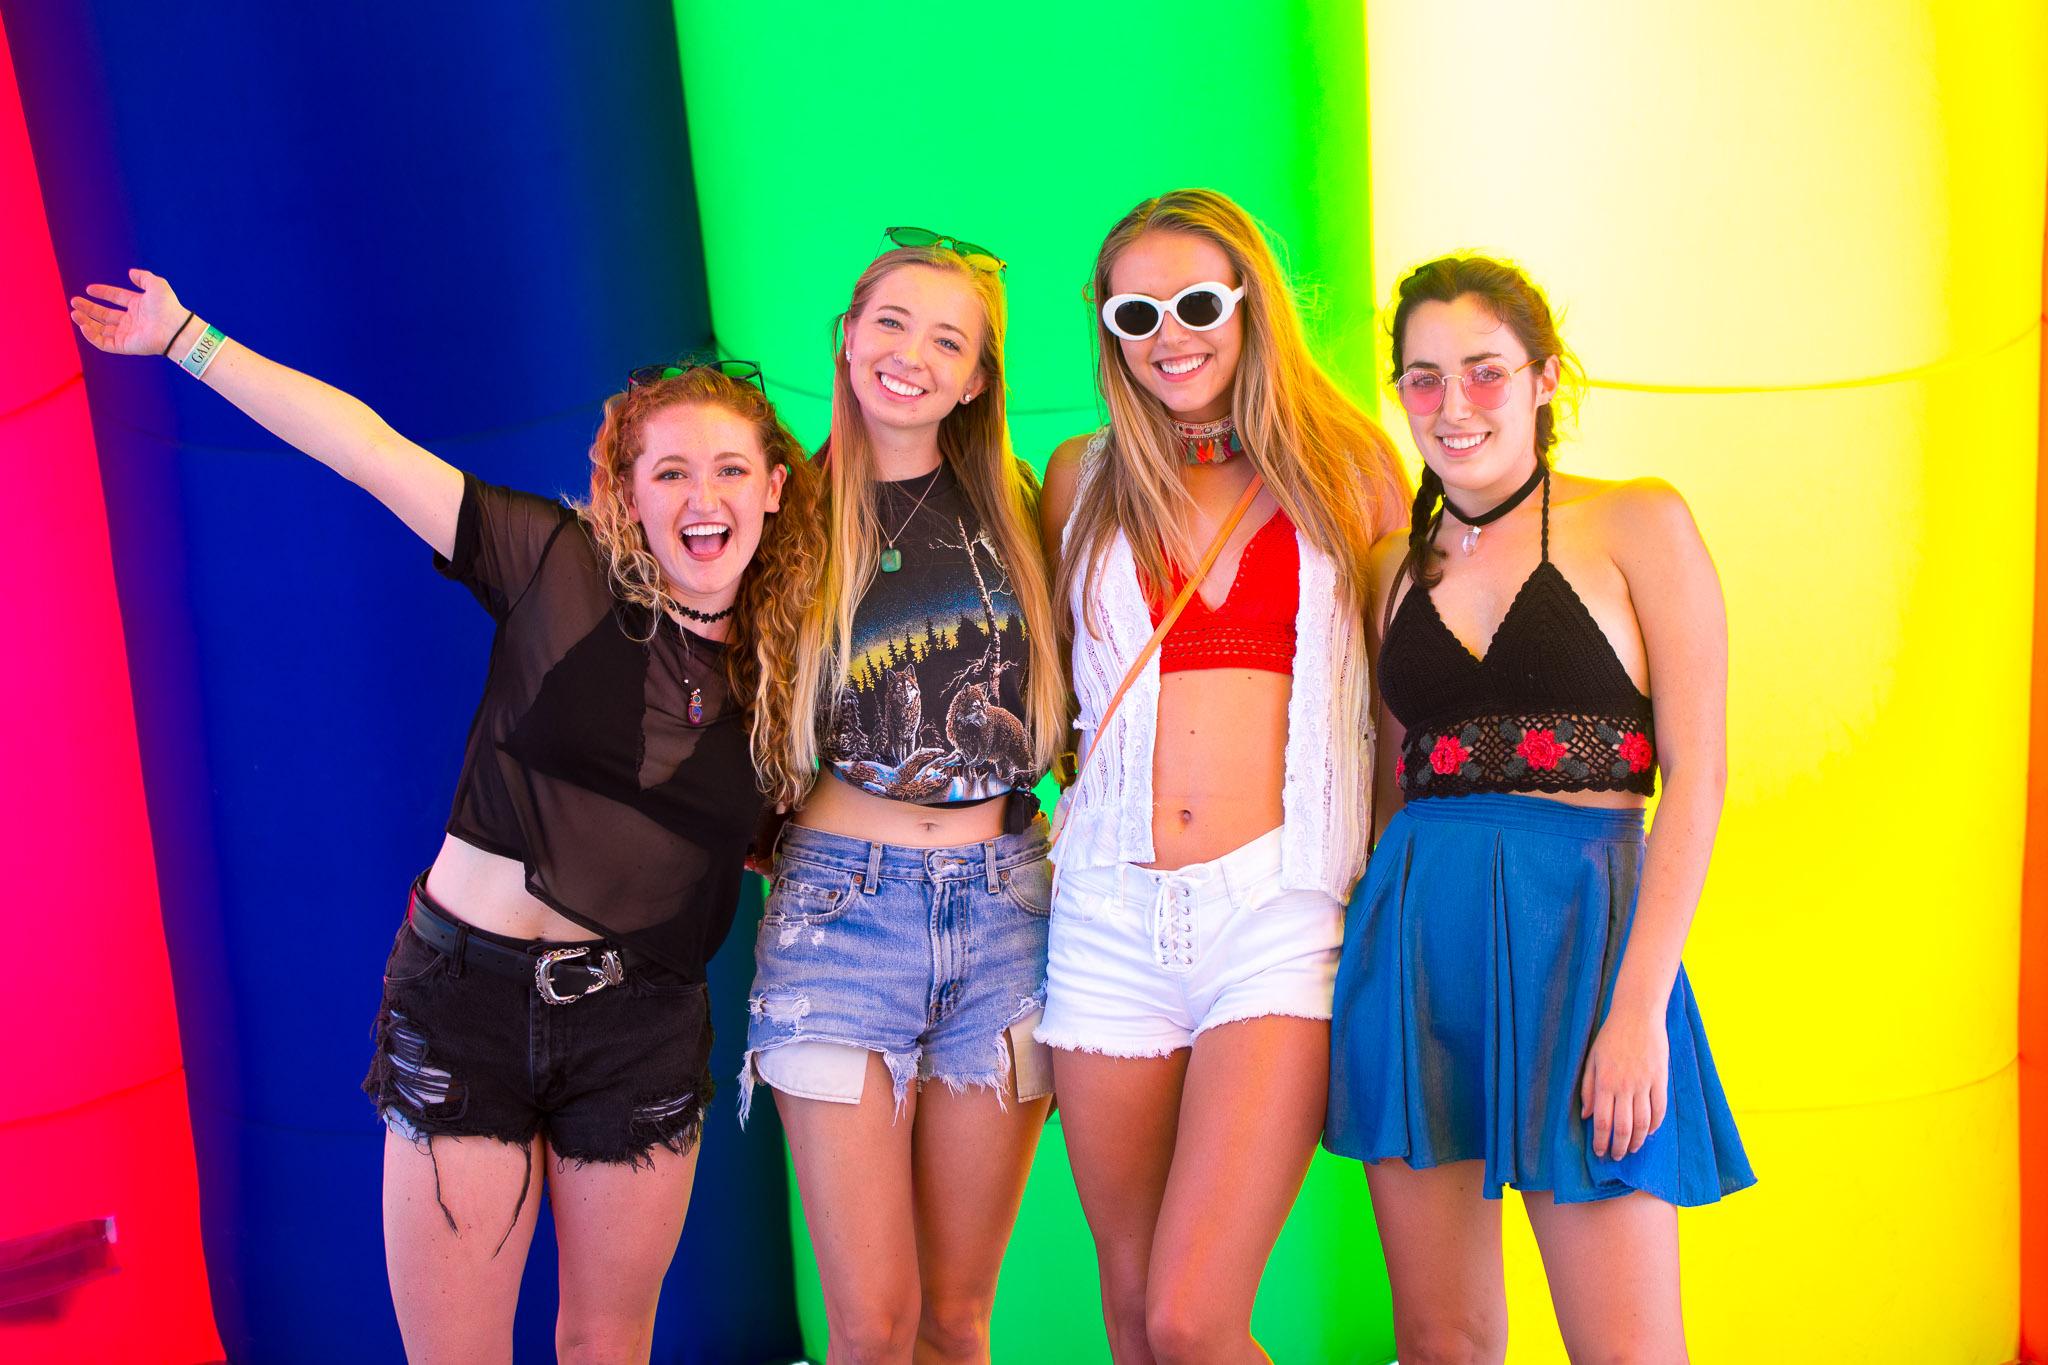 Atmosphere_Laneway-Festival-Brisbane-2018_Credit-Bianca-Holderness-62.jpg